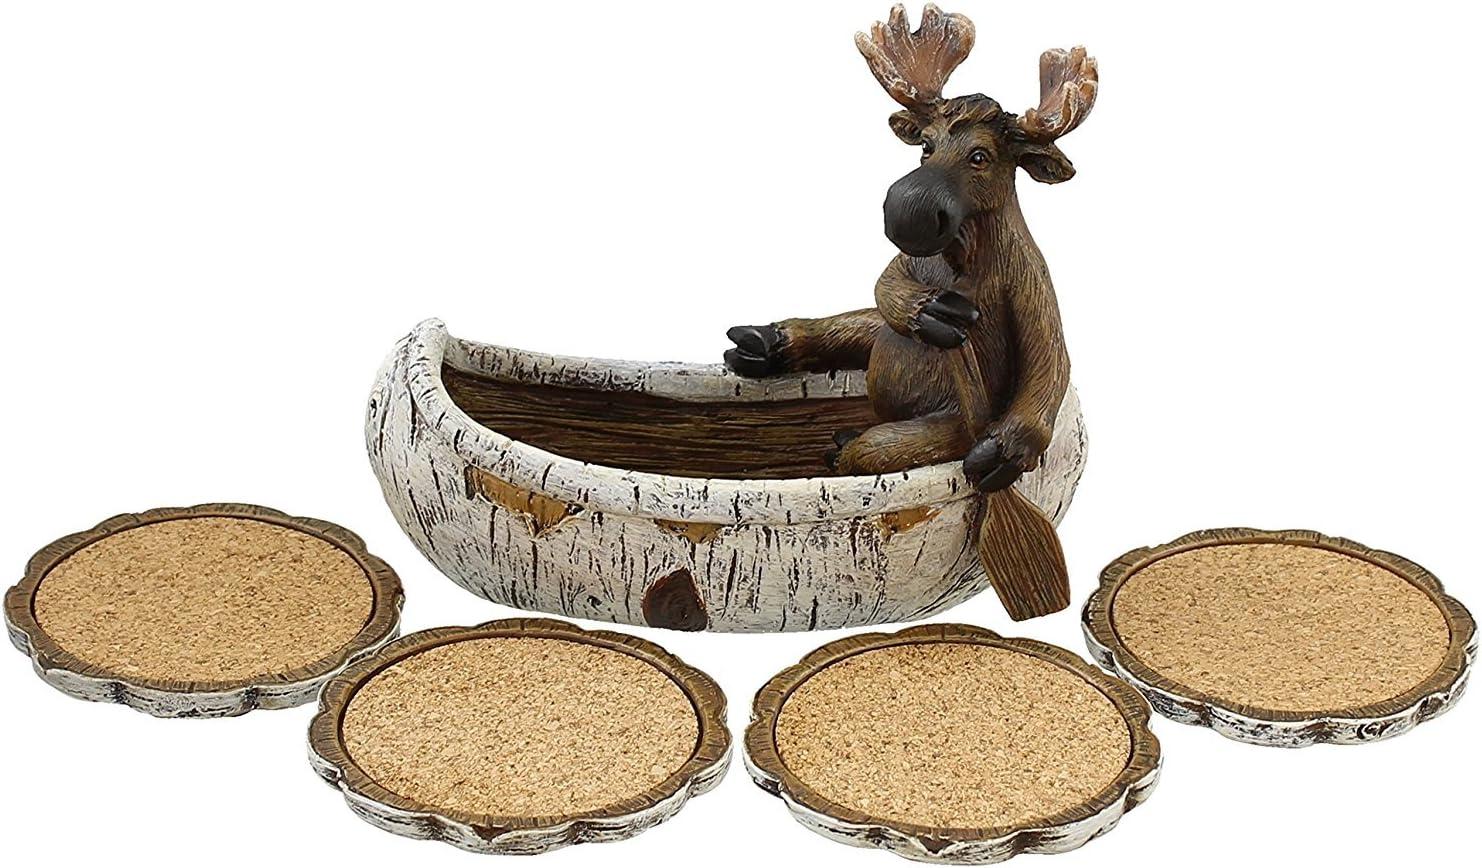 Amazon Com Decorative Moose Canoeing Coaster Set 4 Rustic Cork Coasters Holder Set Coasters